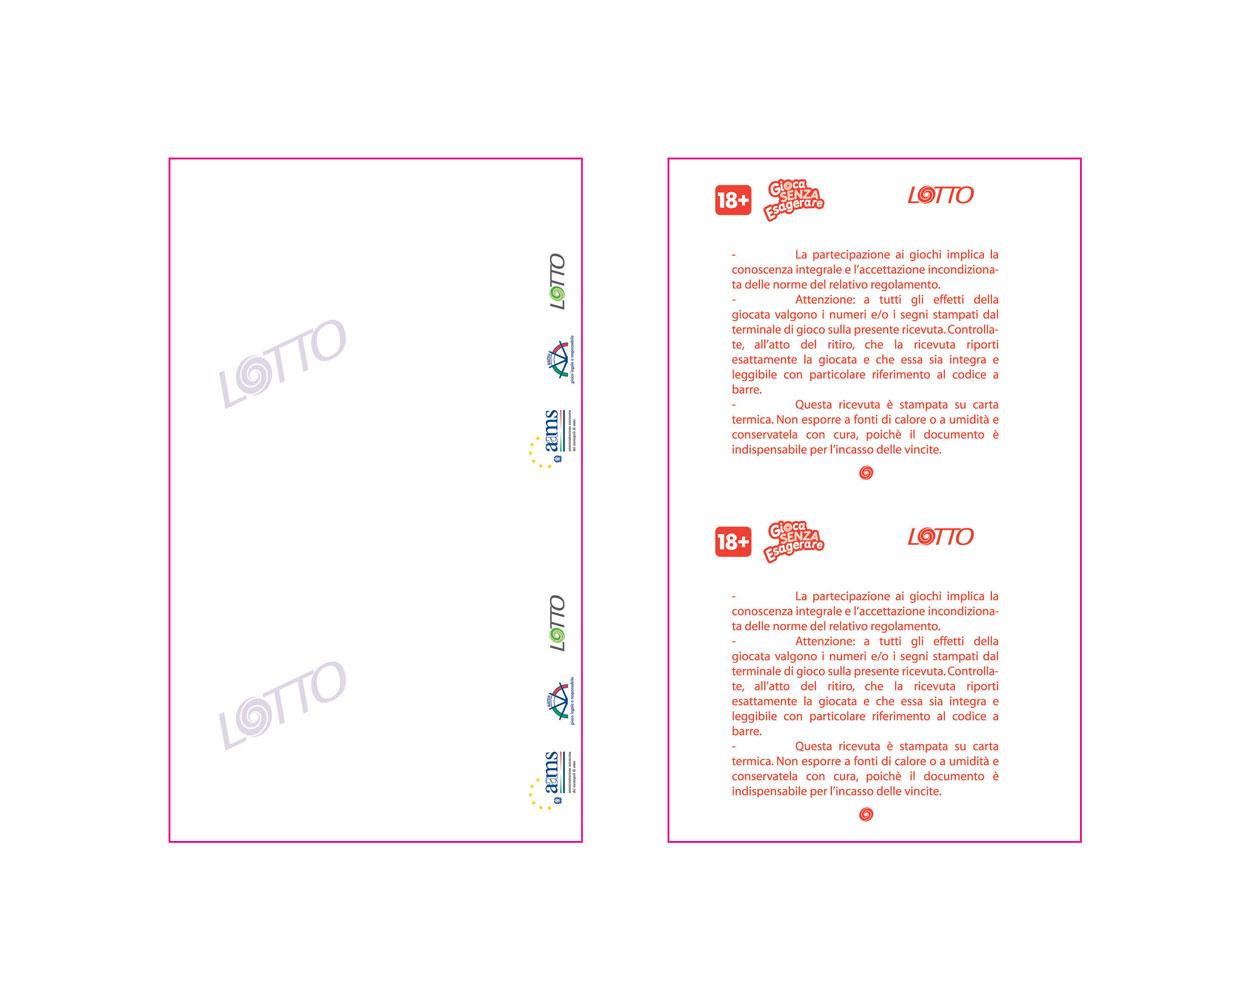 LOTTOMATICA_00_NO-LOGO-1